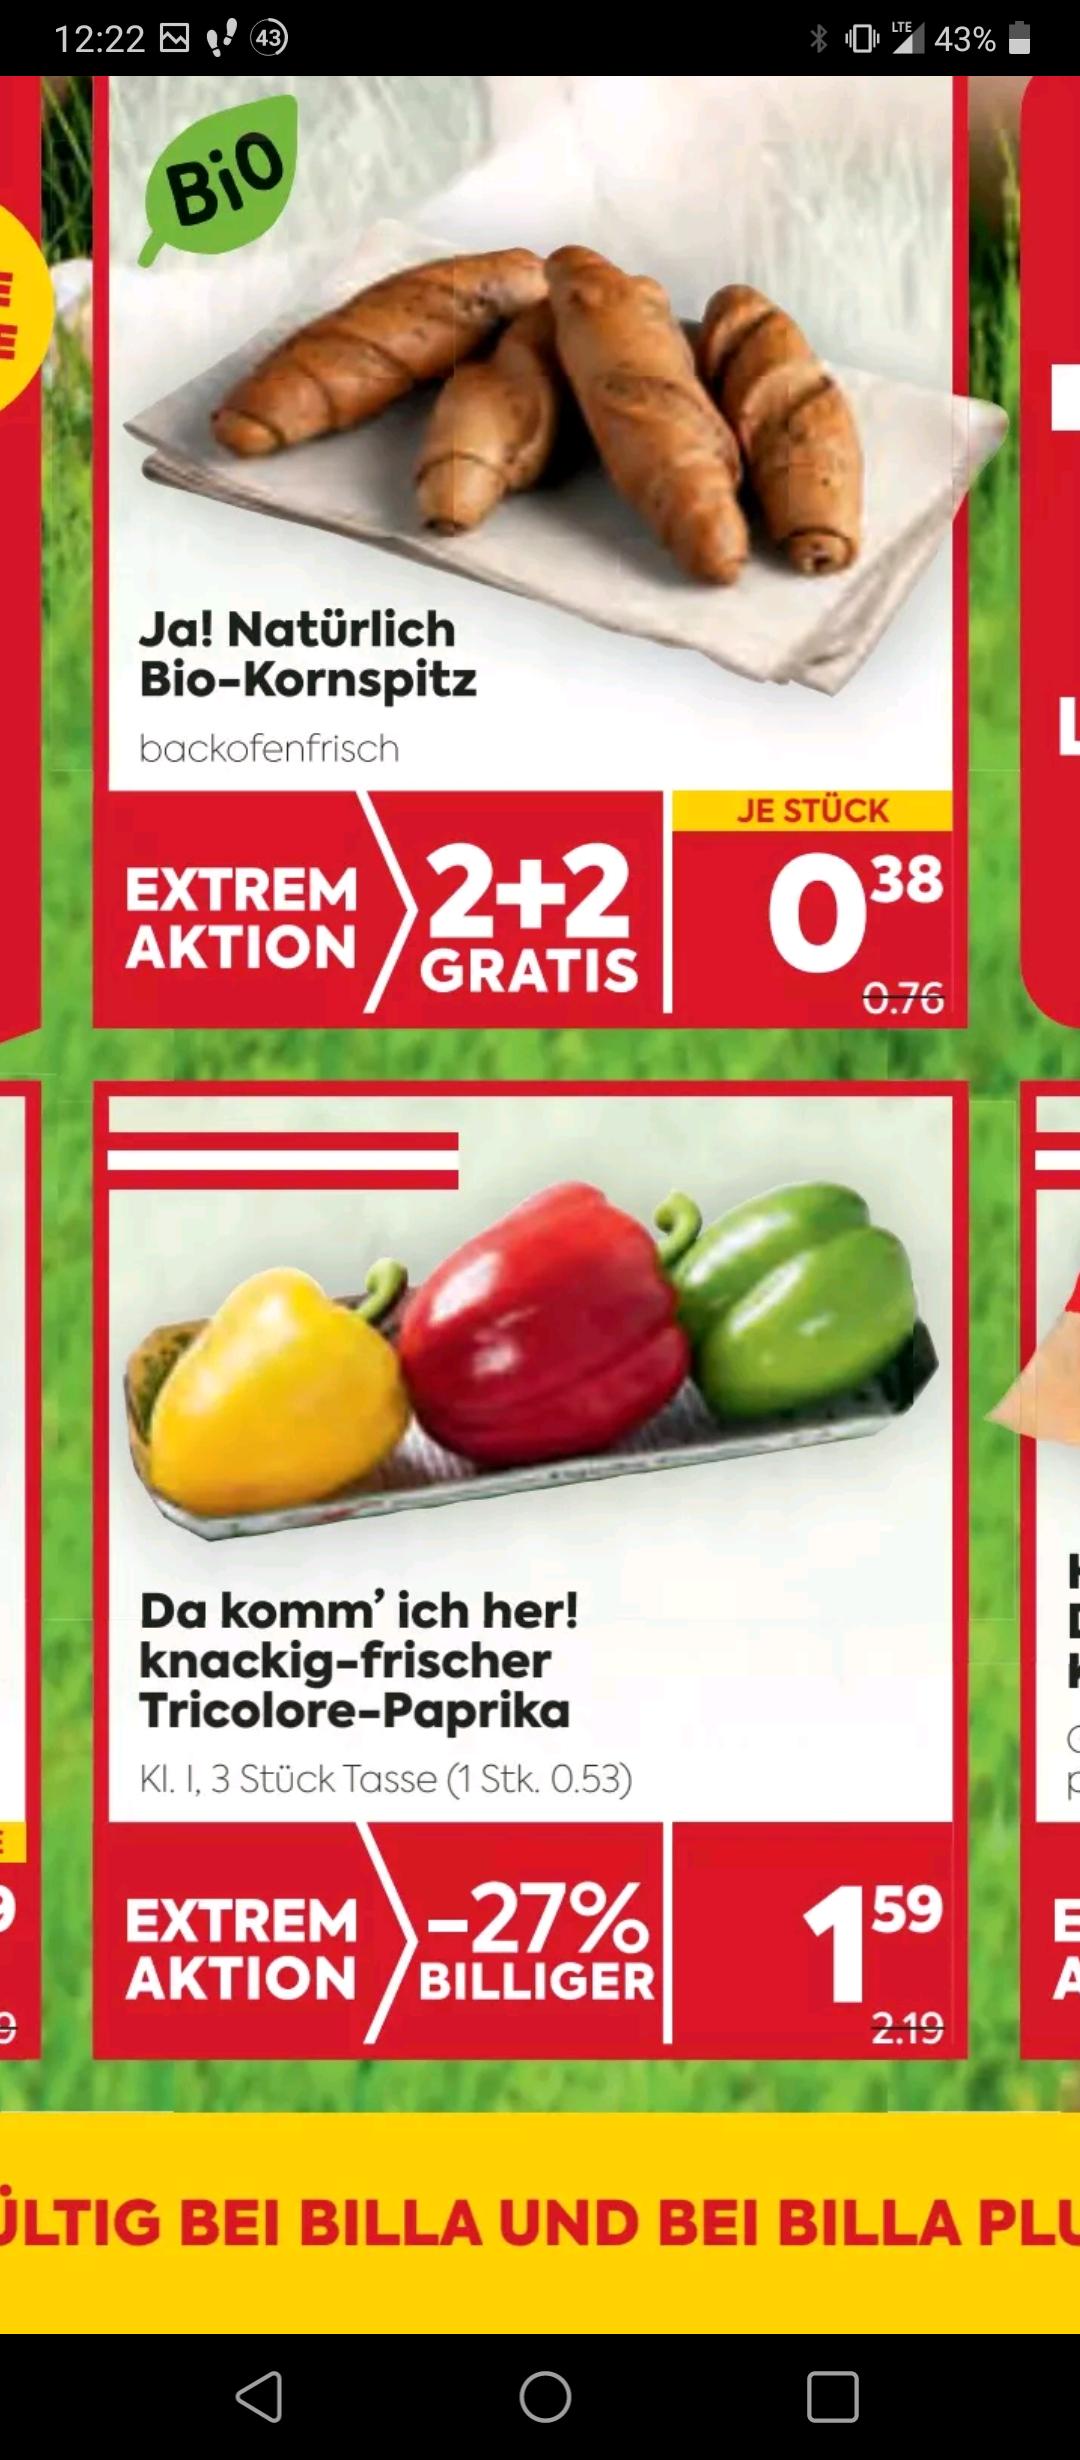 Tricolore Paprika bei Billa